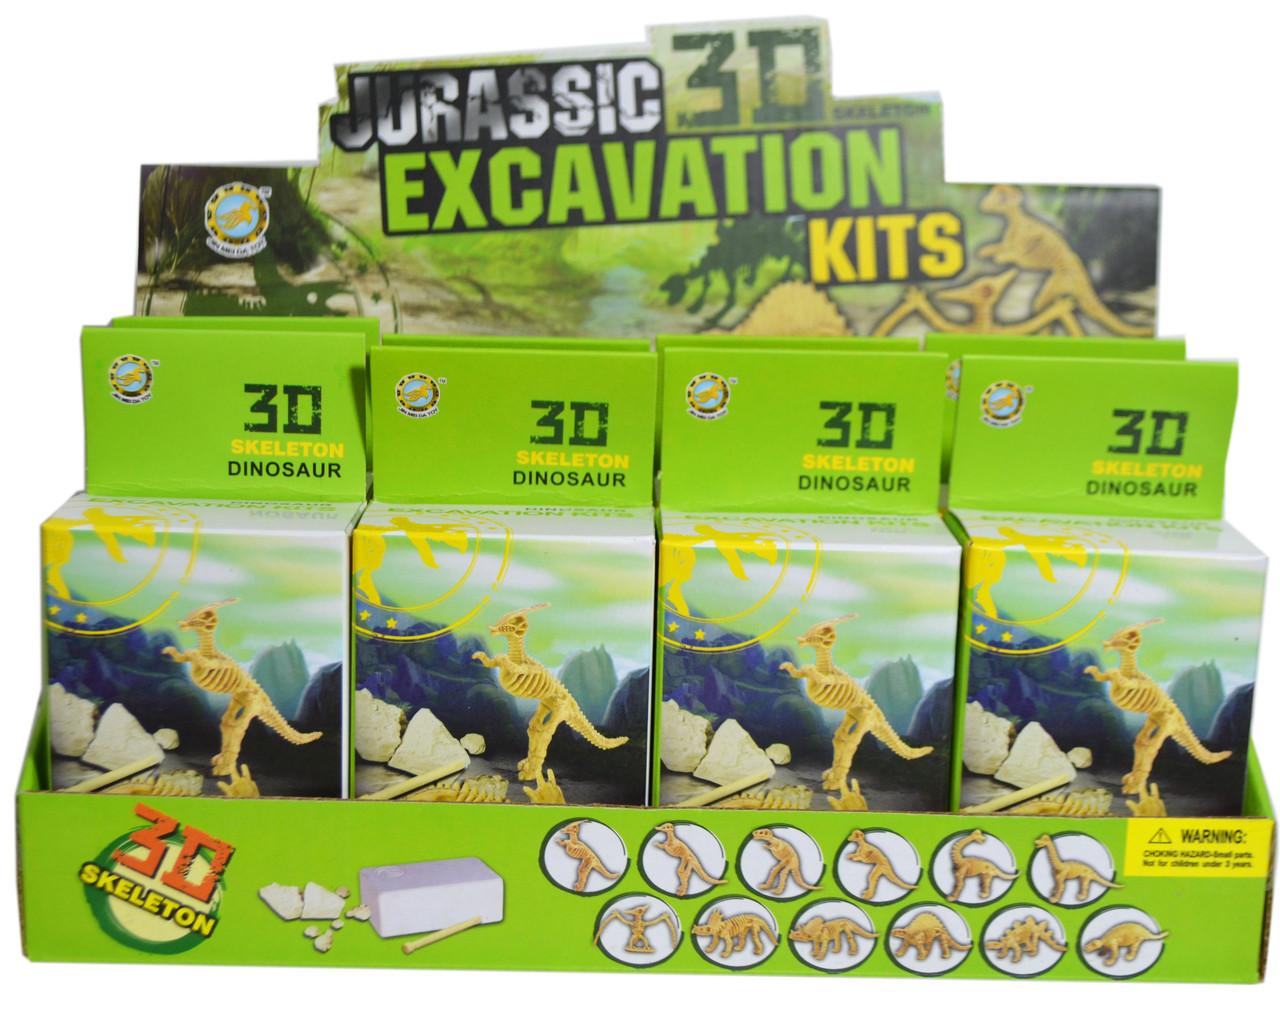 507A  Раскопки Динозавра Jurassic excavation kits цена за 12 шт 10*6